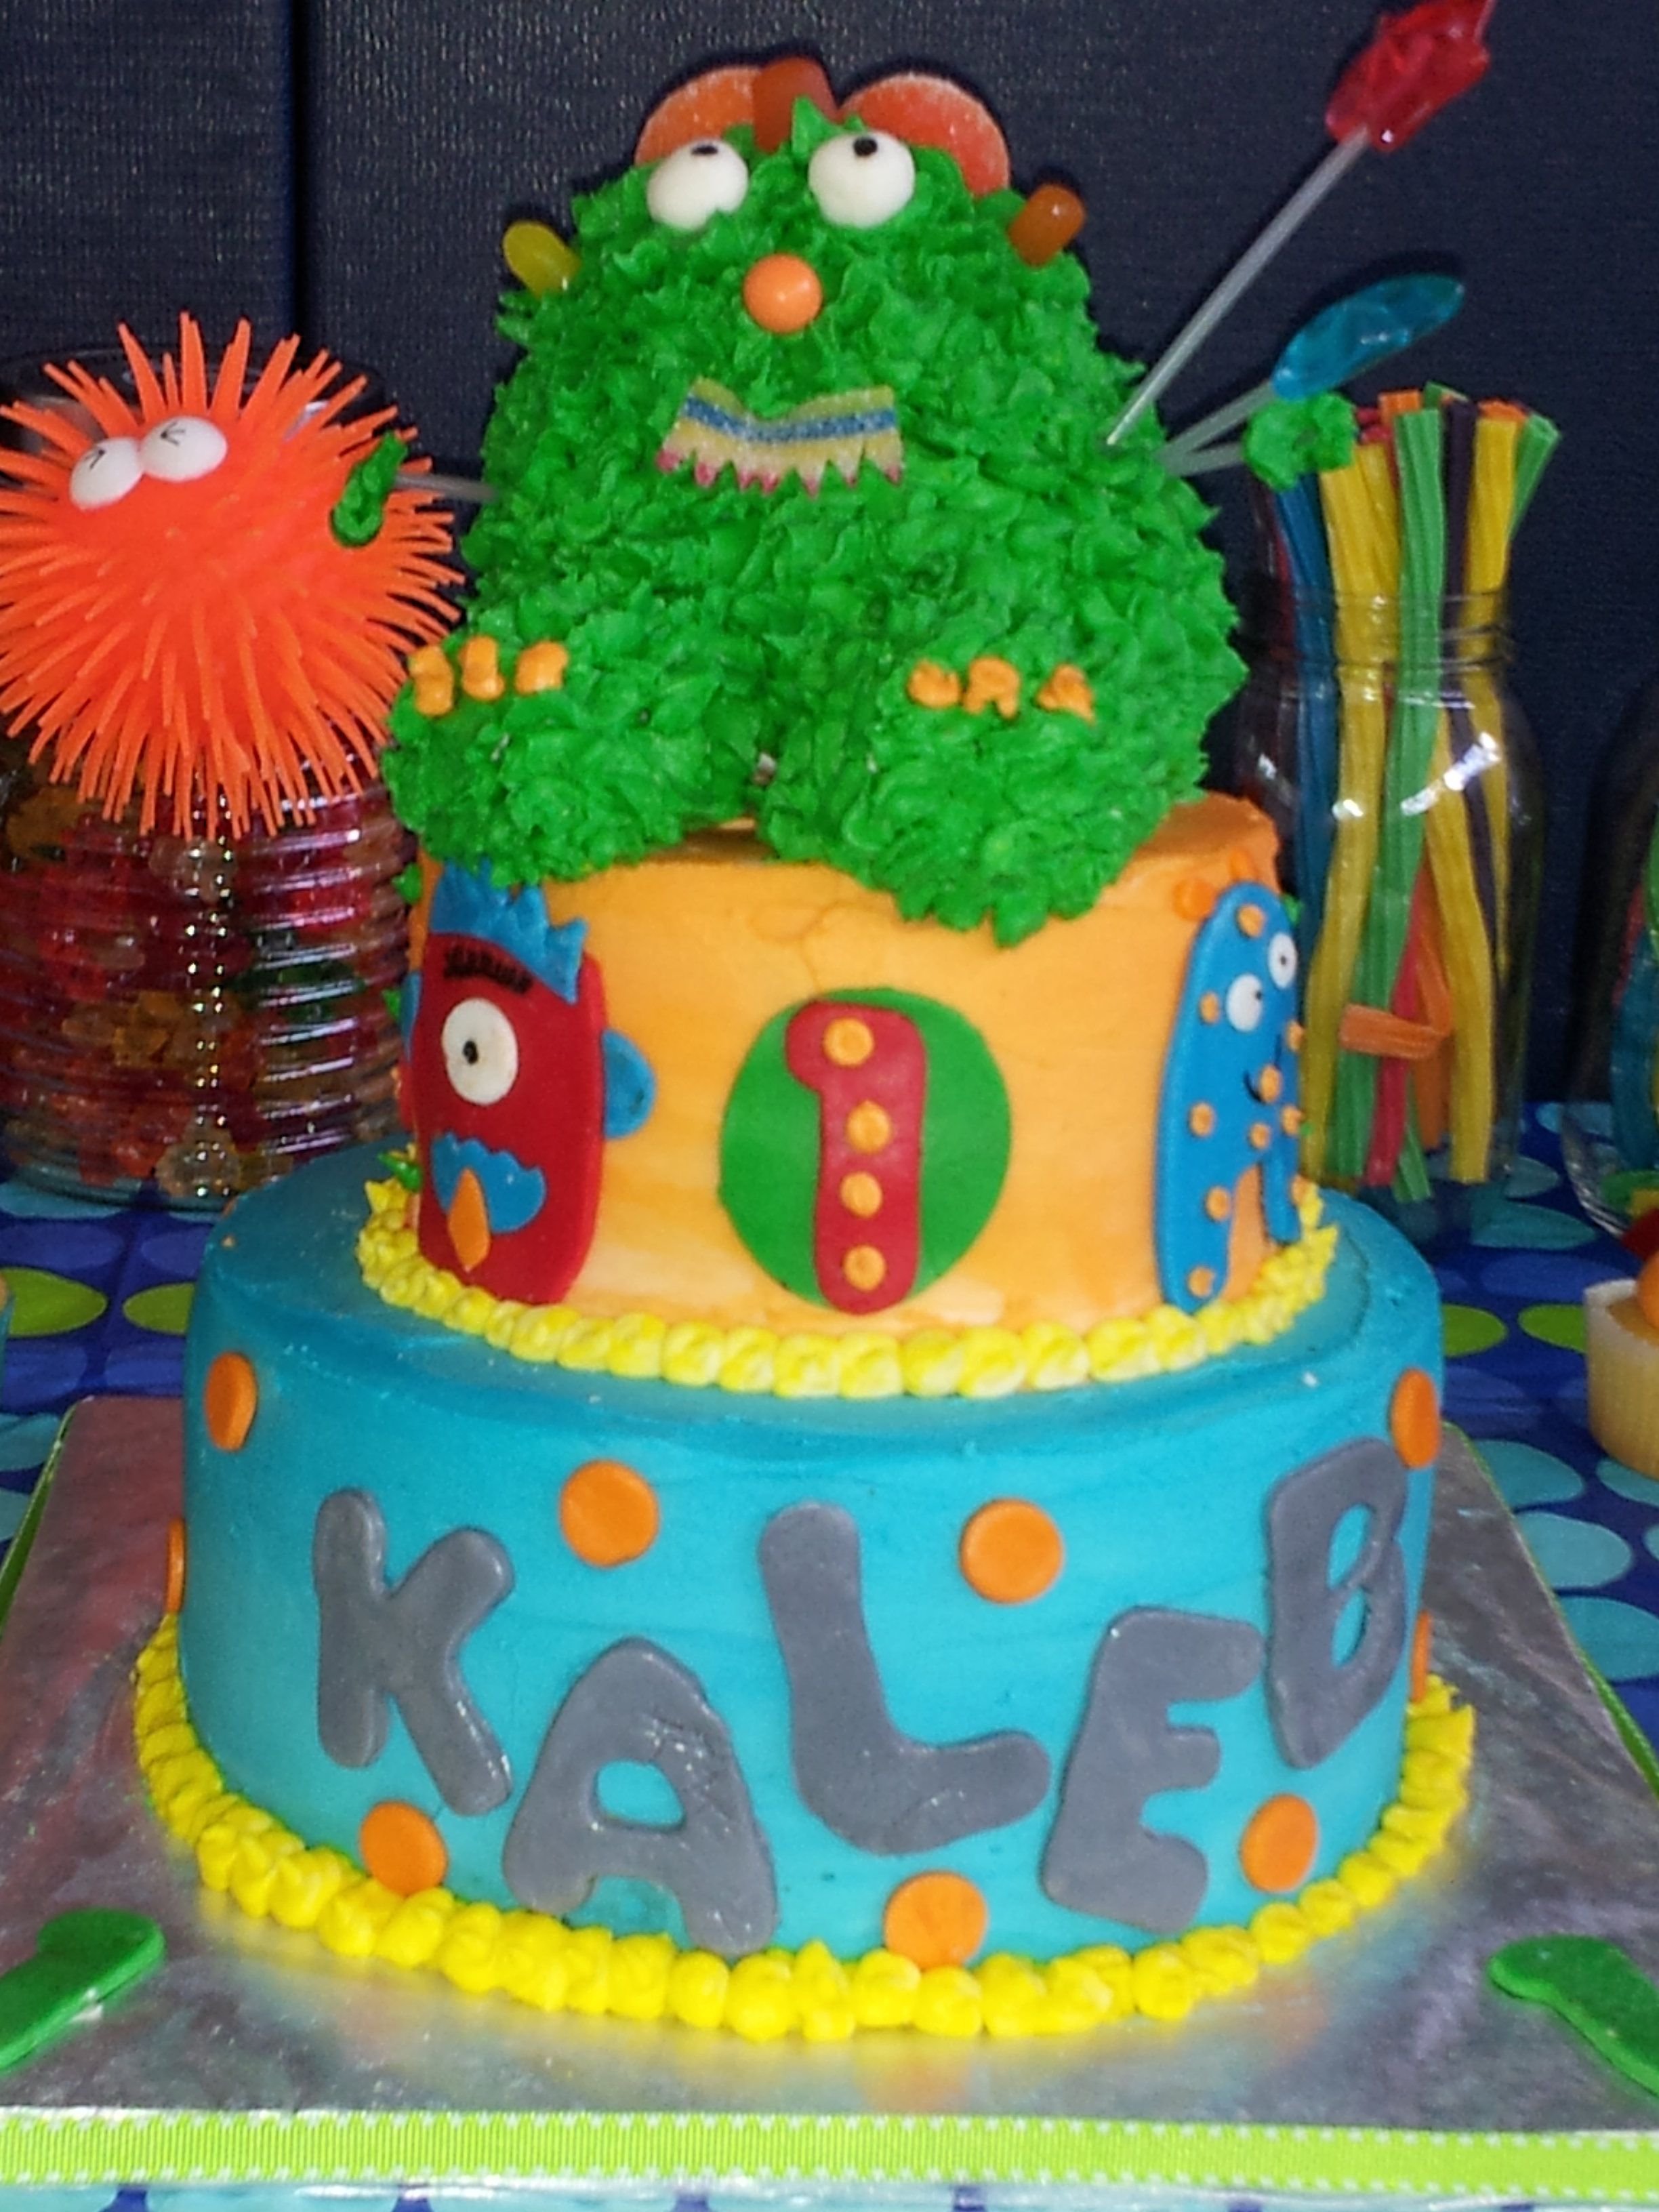 Monter cake